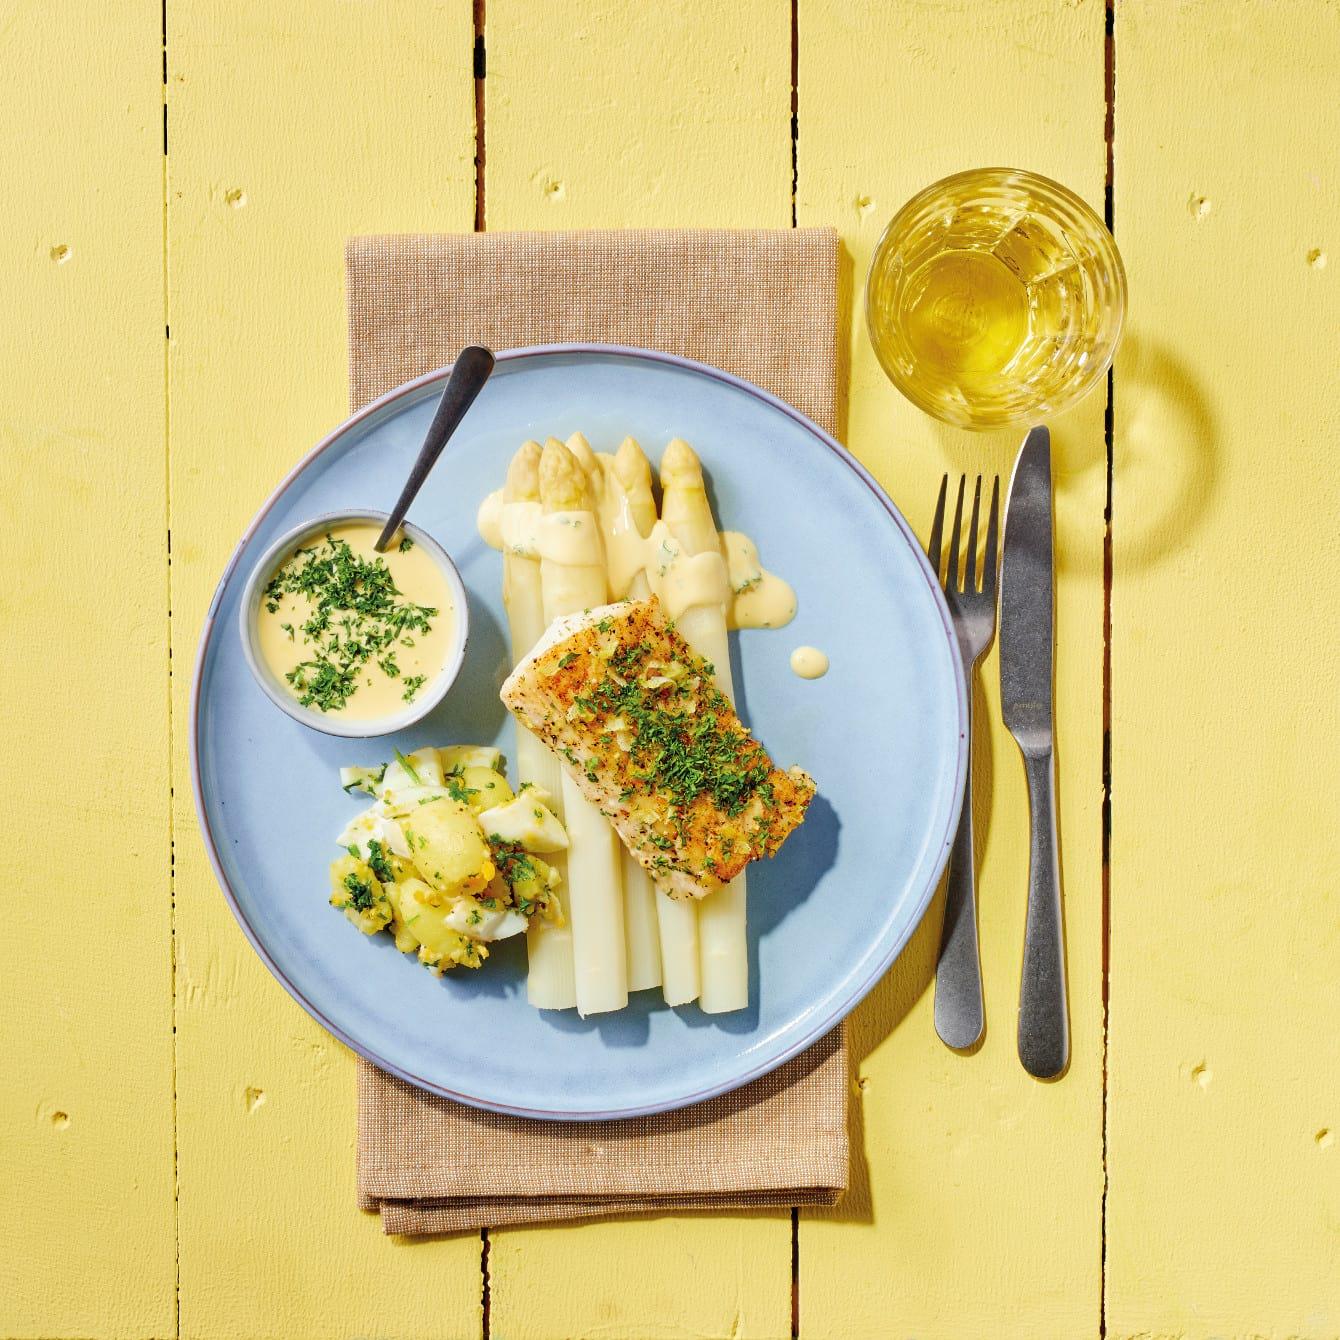 Gekookte witte asperges met geprakte krieltjes en gebakken kabeljauwfilet